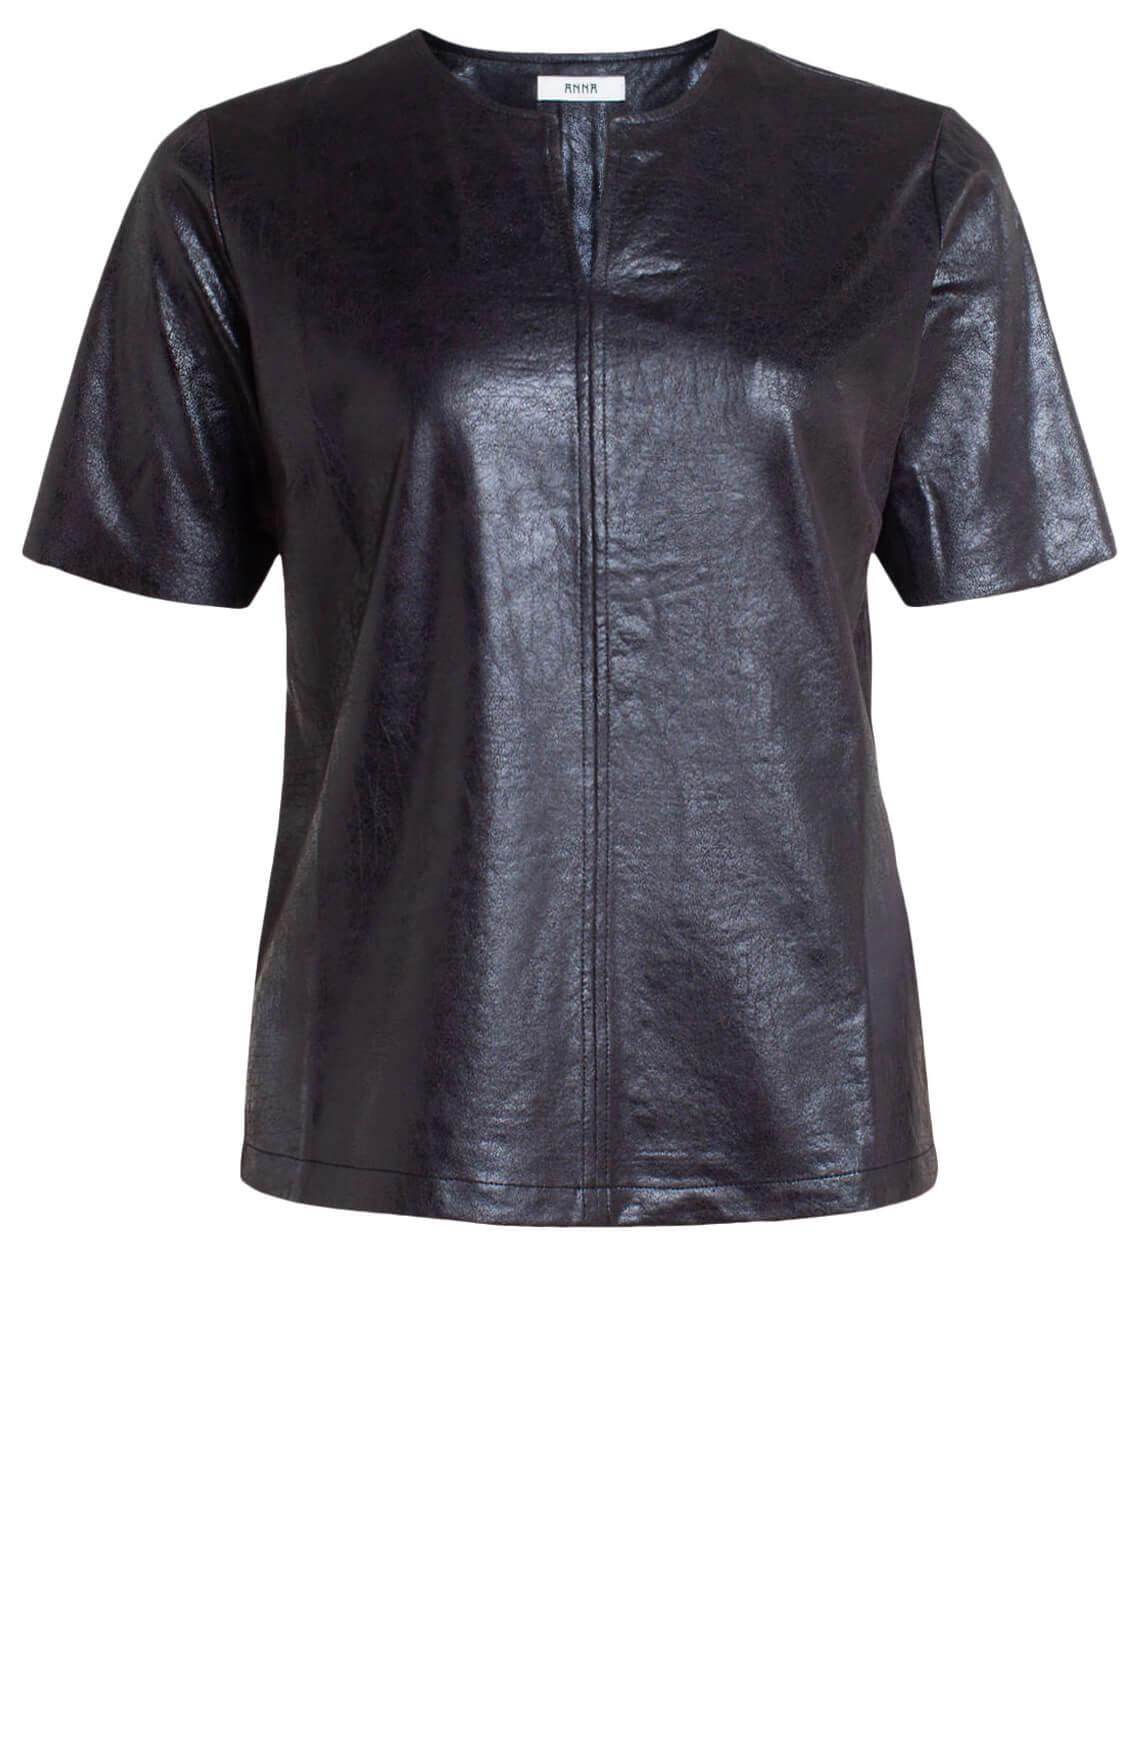 Anna Dames Fake leather shirt zwart